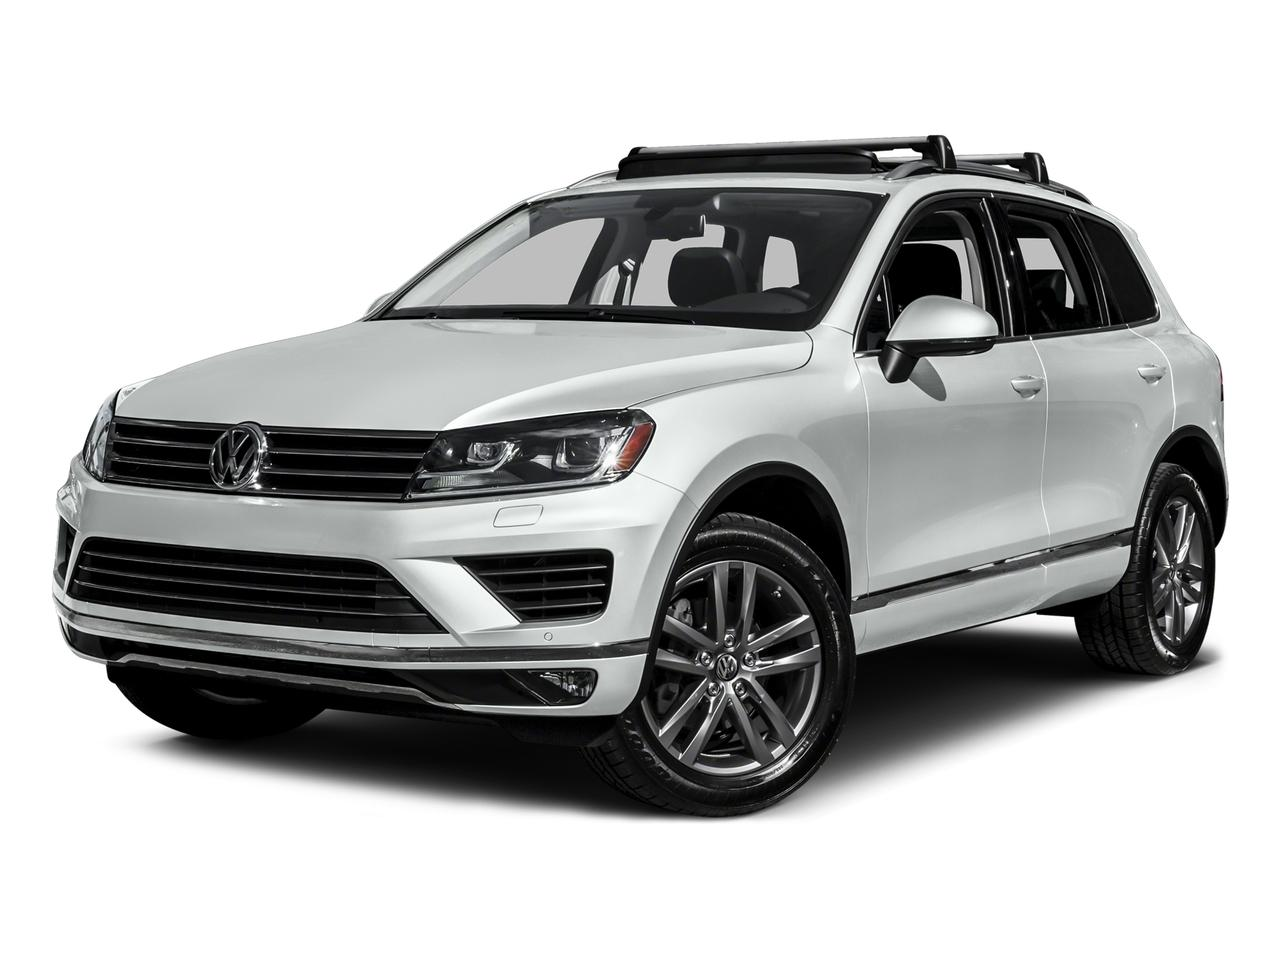 2016 Volkswagen Touareg Vehicle Photo in Akron, OH 44320